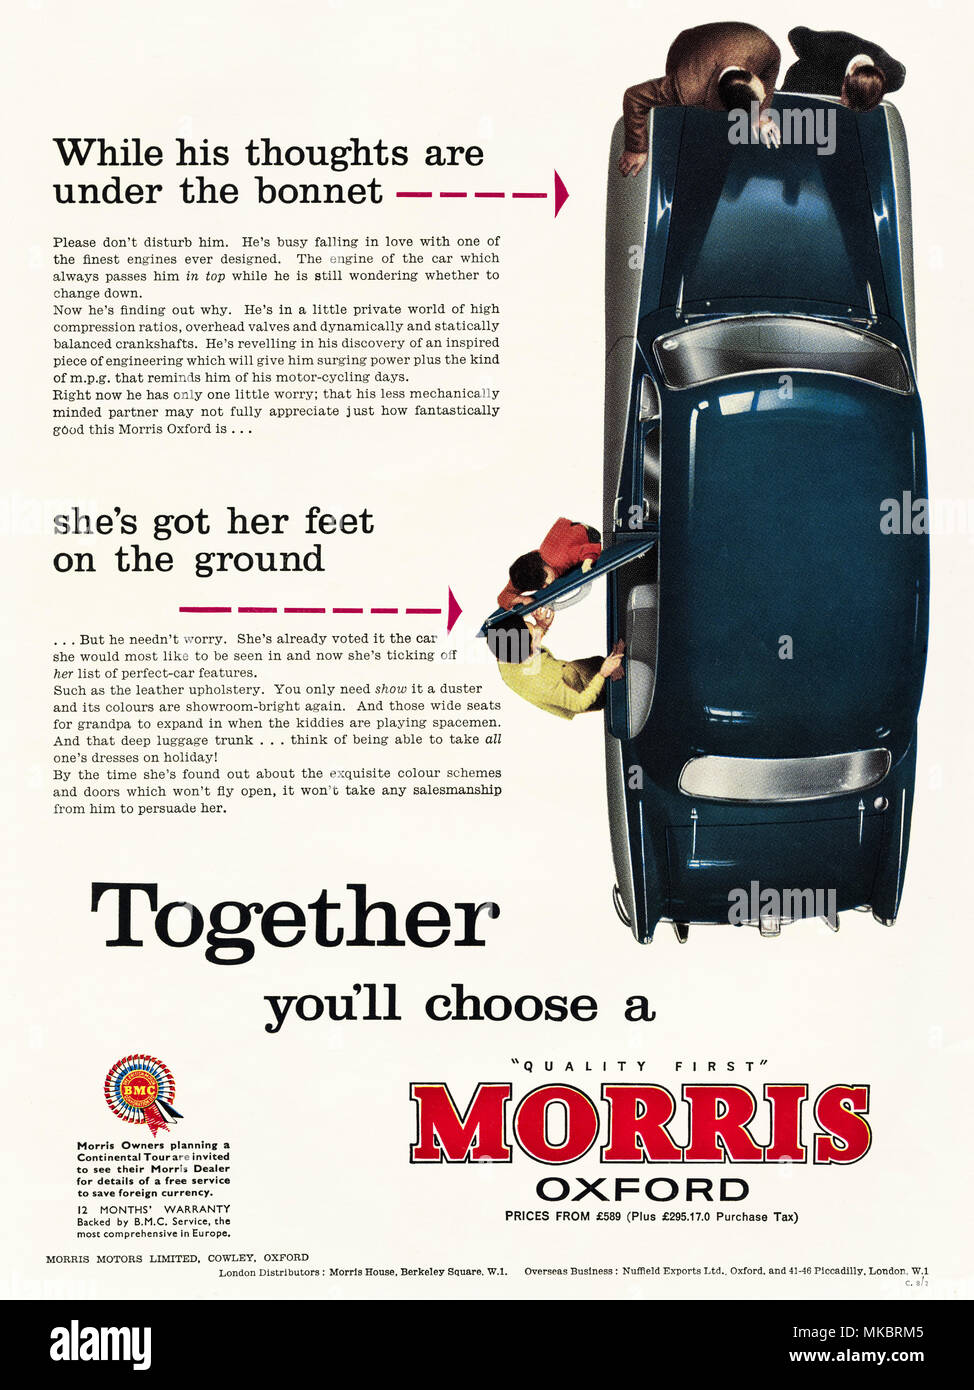 1950s vintage original advertisement advertising new Morris Oxford car of Cowley Oxford England UK in English magazine circa 1958 - Stock Image